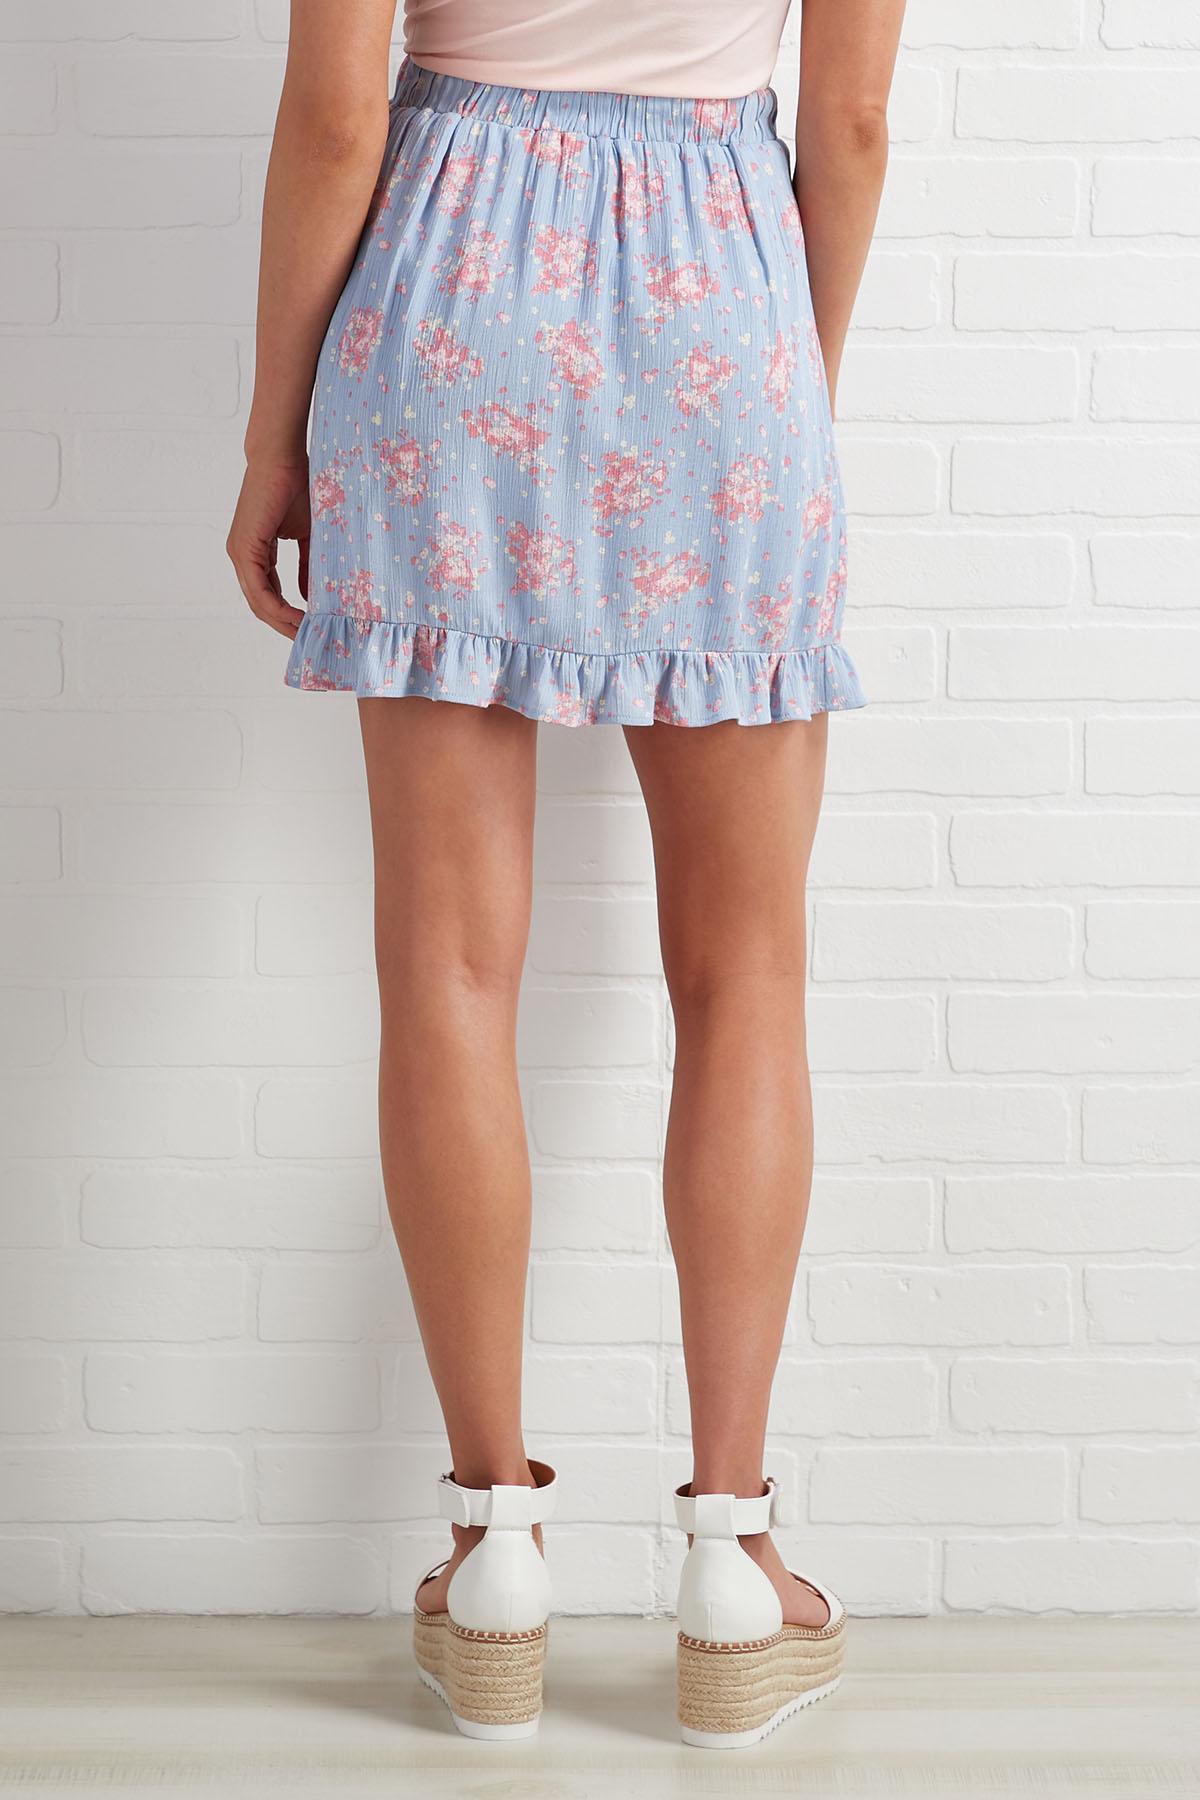 Flower Shop Skirt